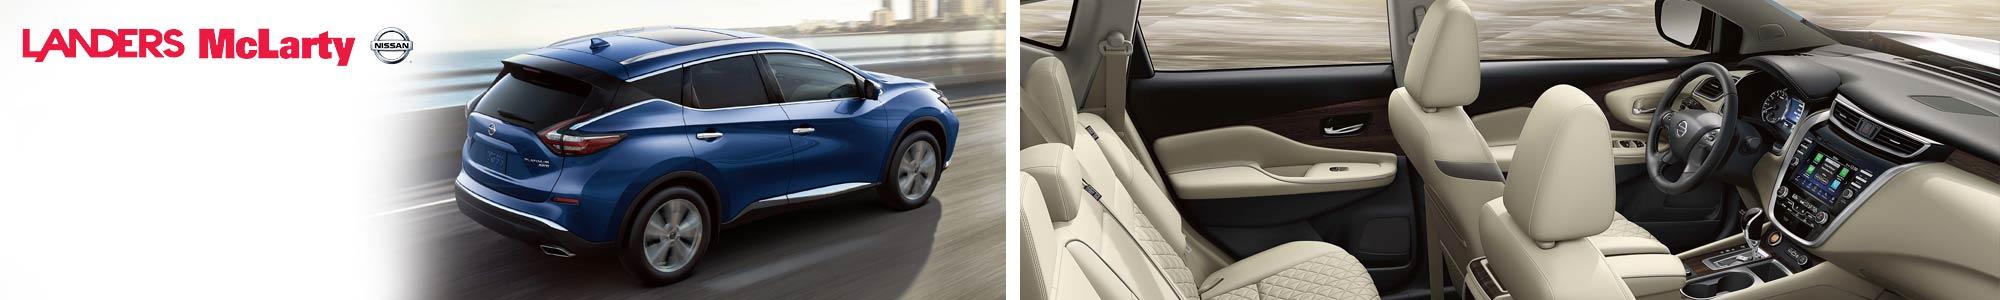 2020 Nissan Murano Interior and Exterior